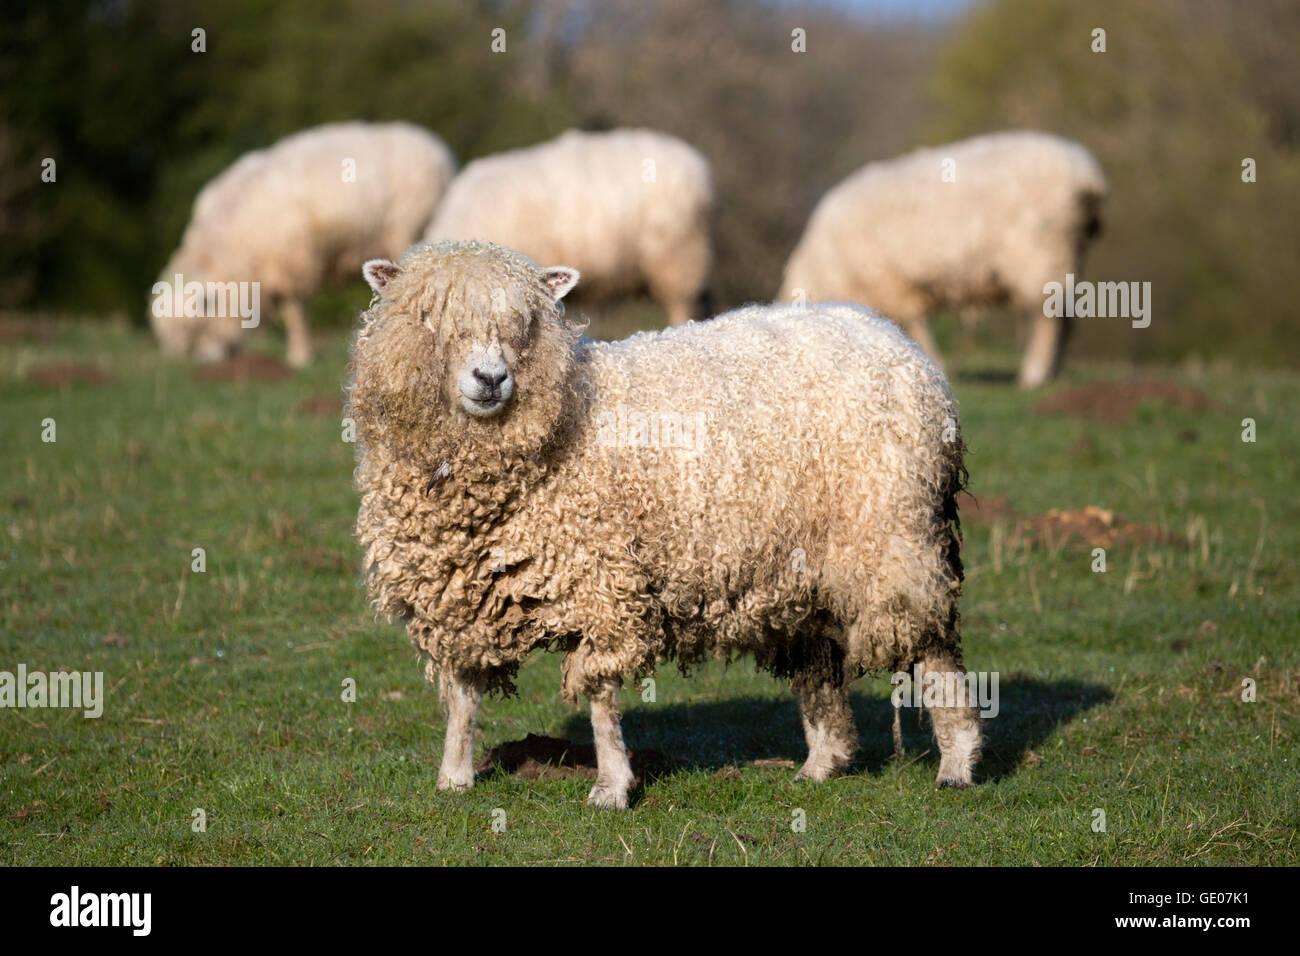 Cotswold Lion raza de ovejas, Cotswolds, Gloucestershire, Inglaterra, Reino Unido, Europa Imagen De Stock